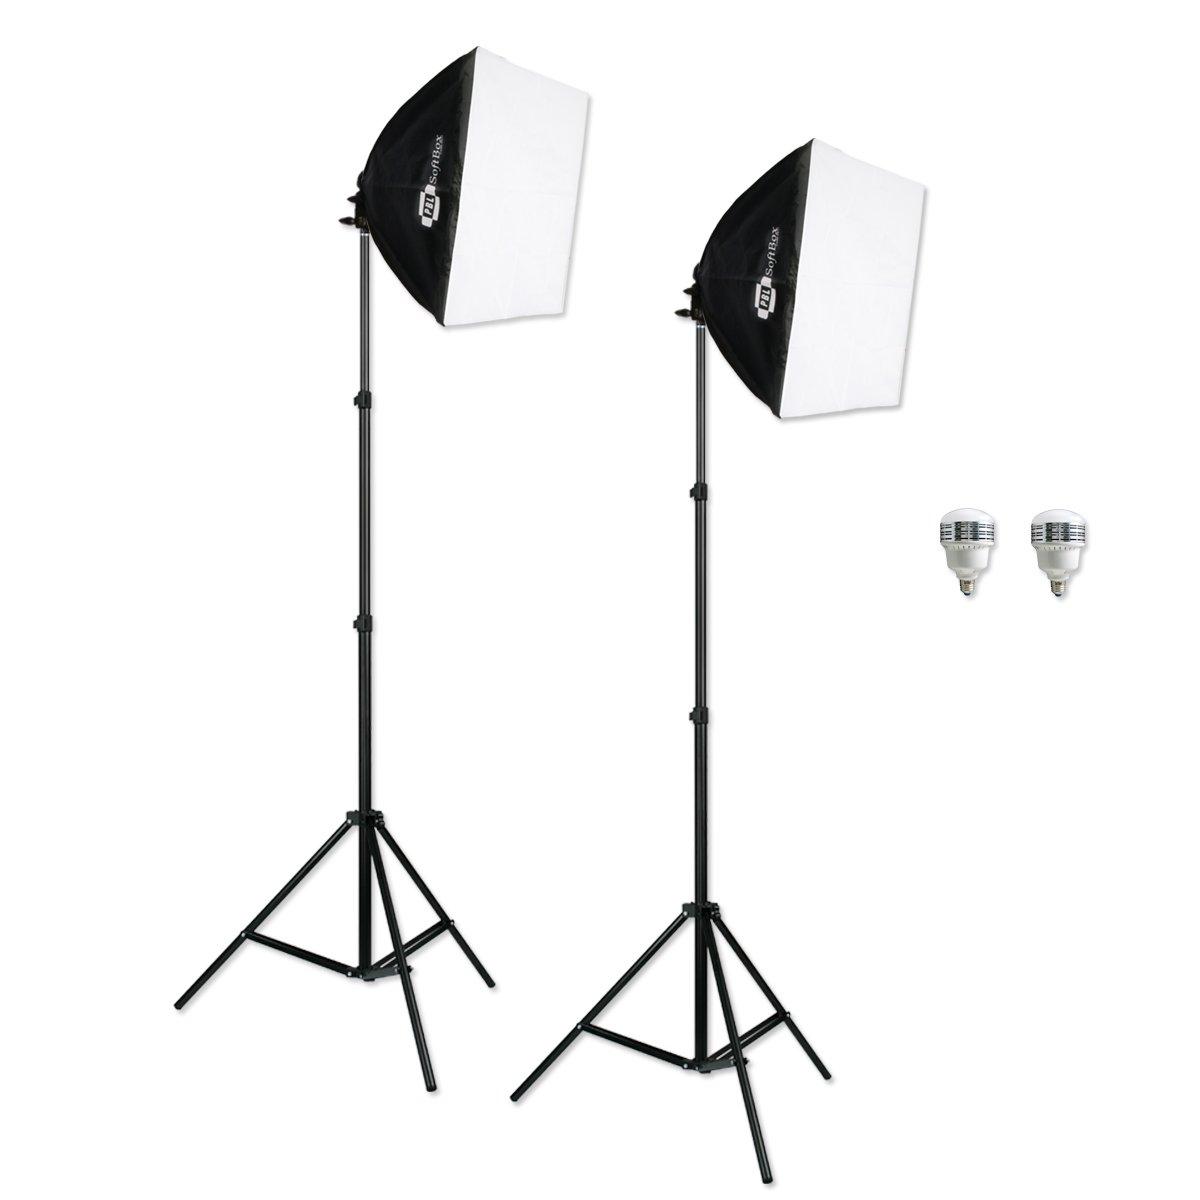 ePhoto Photography Vidoe Lighting Kit ChromaKey Green Blak White 10x20 Screen Video Lighting Kit by ePhotoInc HKZ05